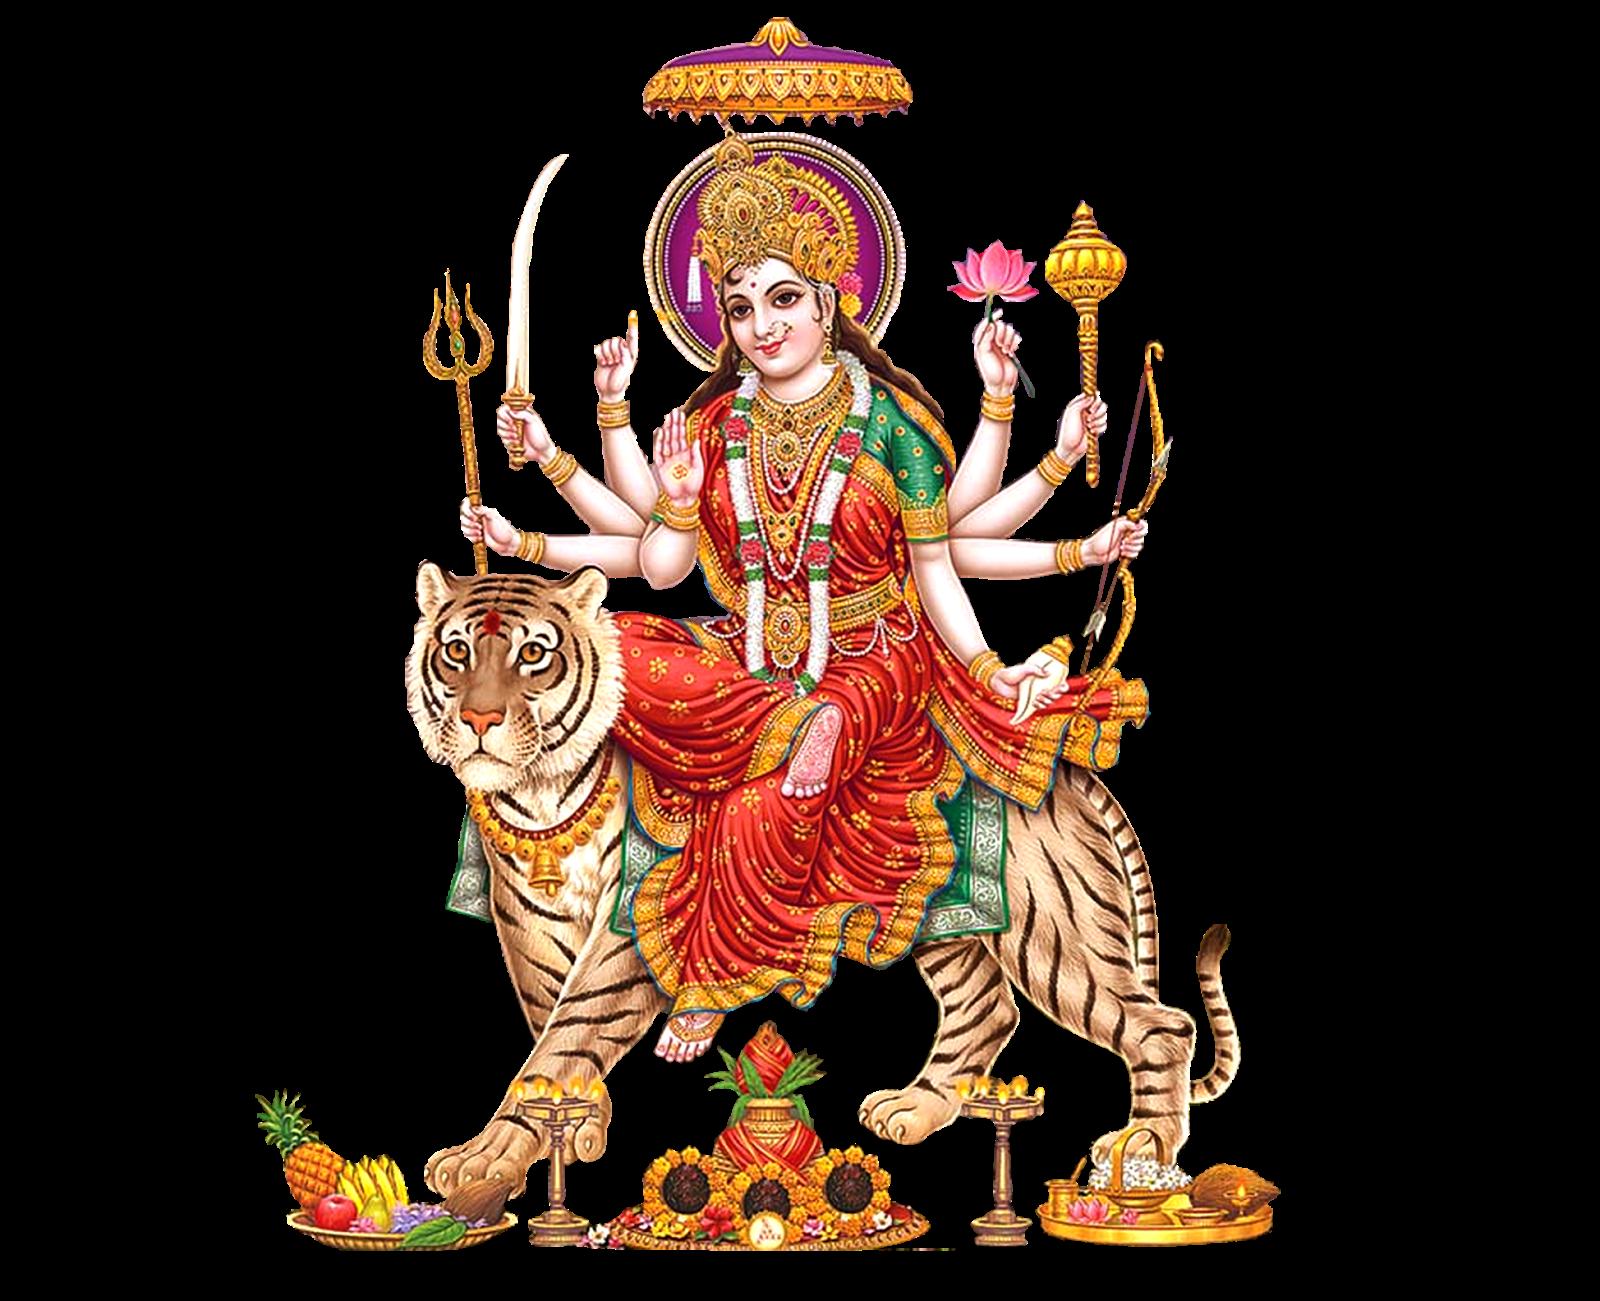 Png Images Of Indian Gods Telugu Vijayadashami Wishes Quotes HD Wallpapers  2016 Vijayadashami Wishes Quotes In - Maa Durga PNG HD